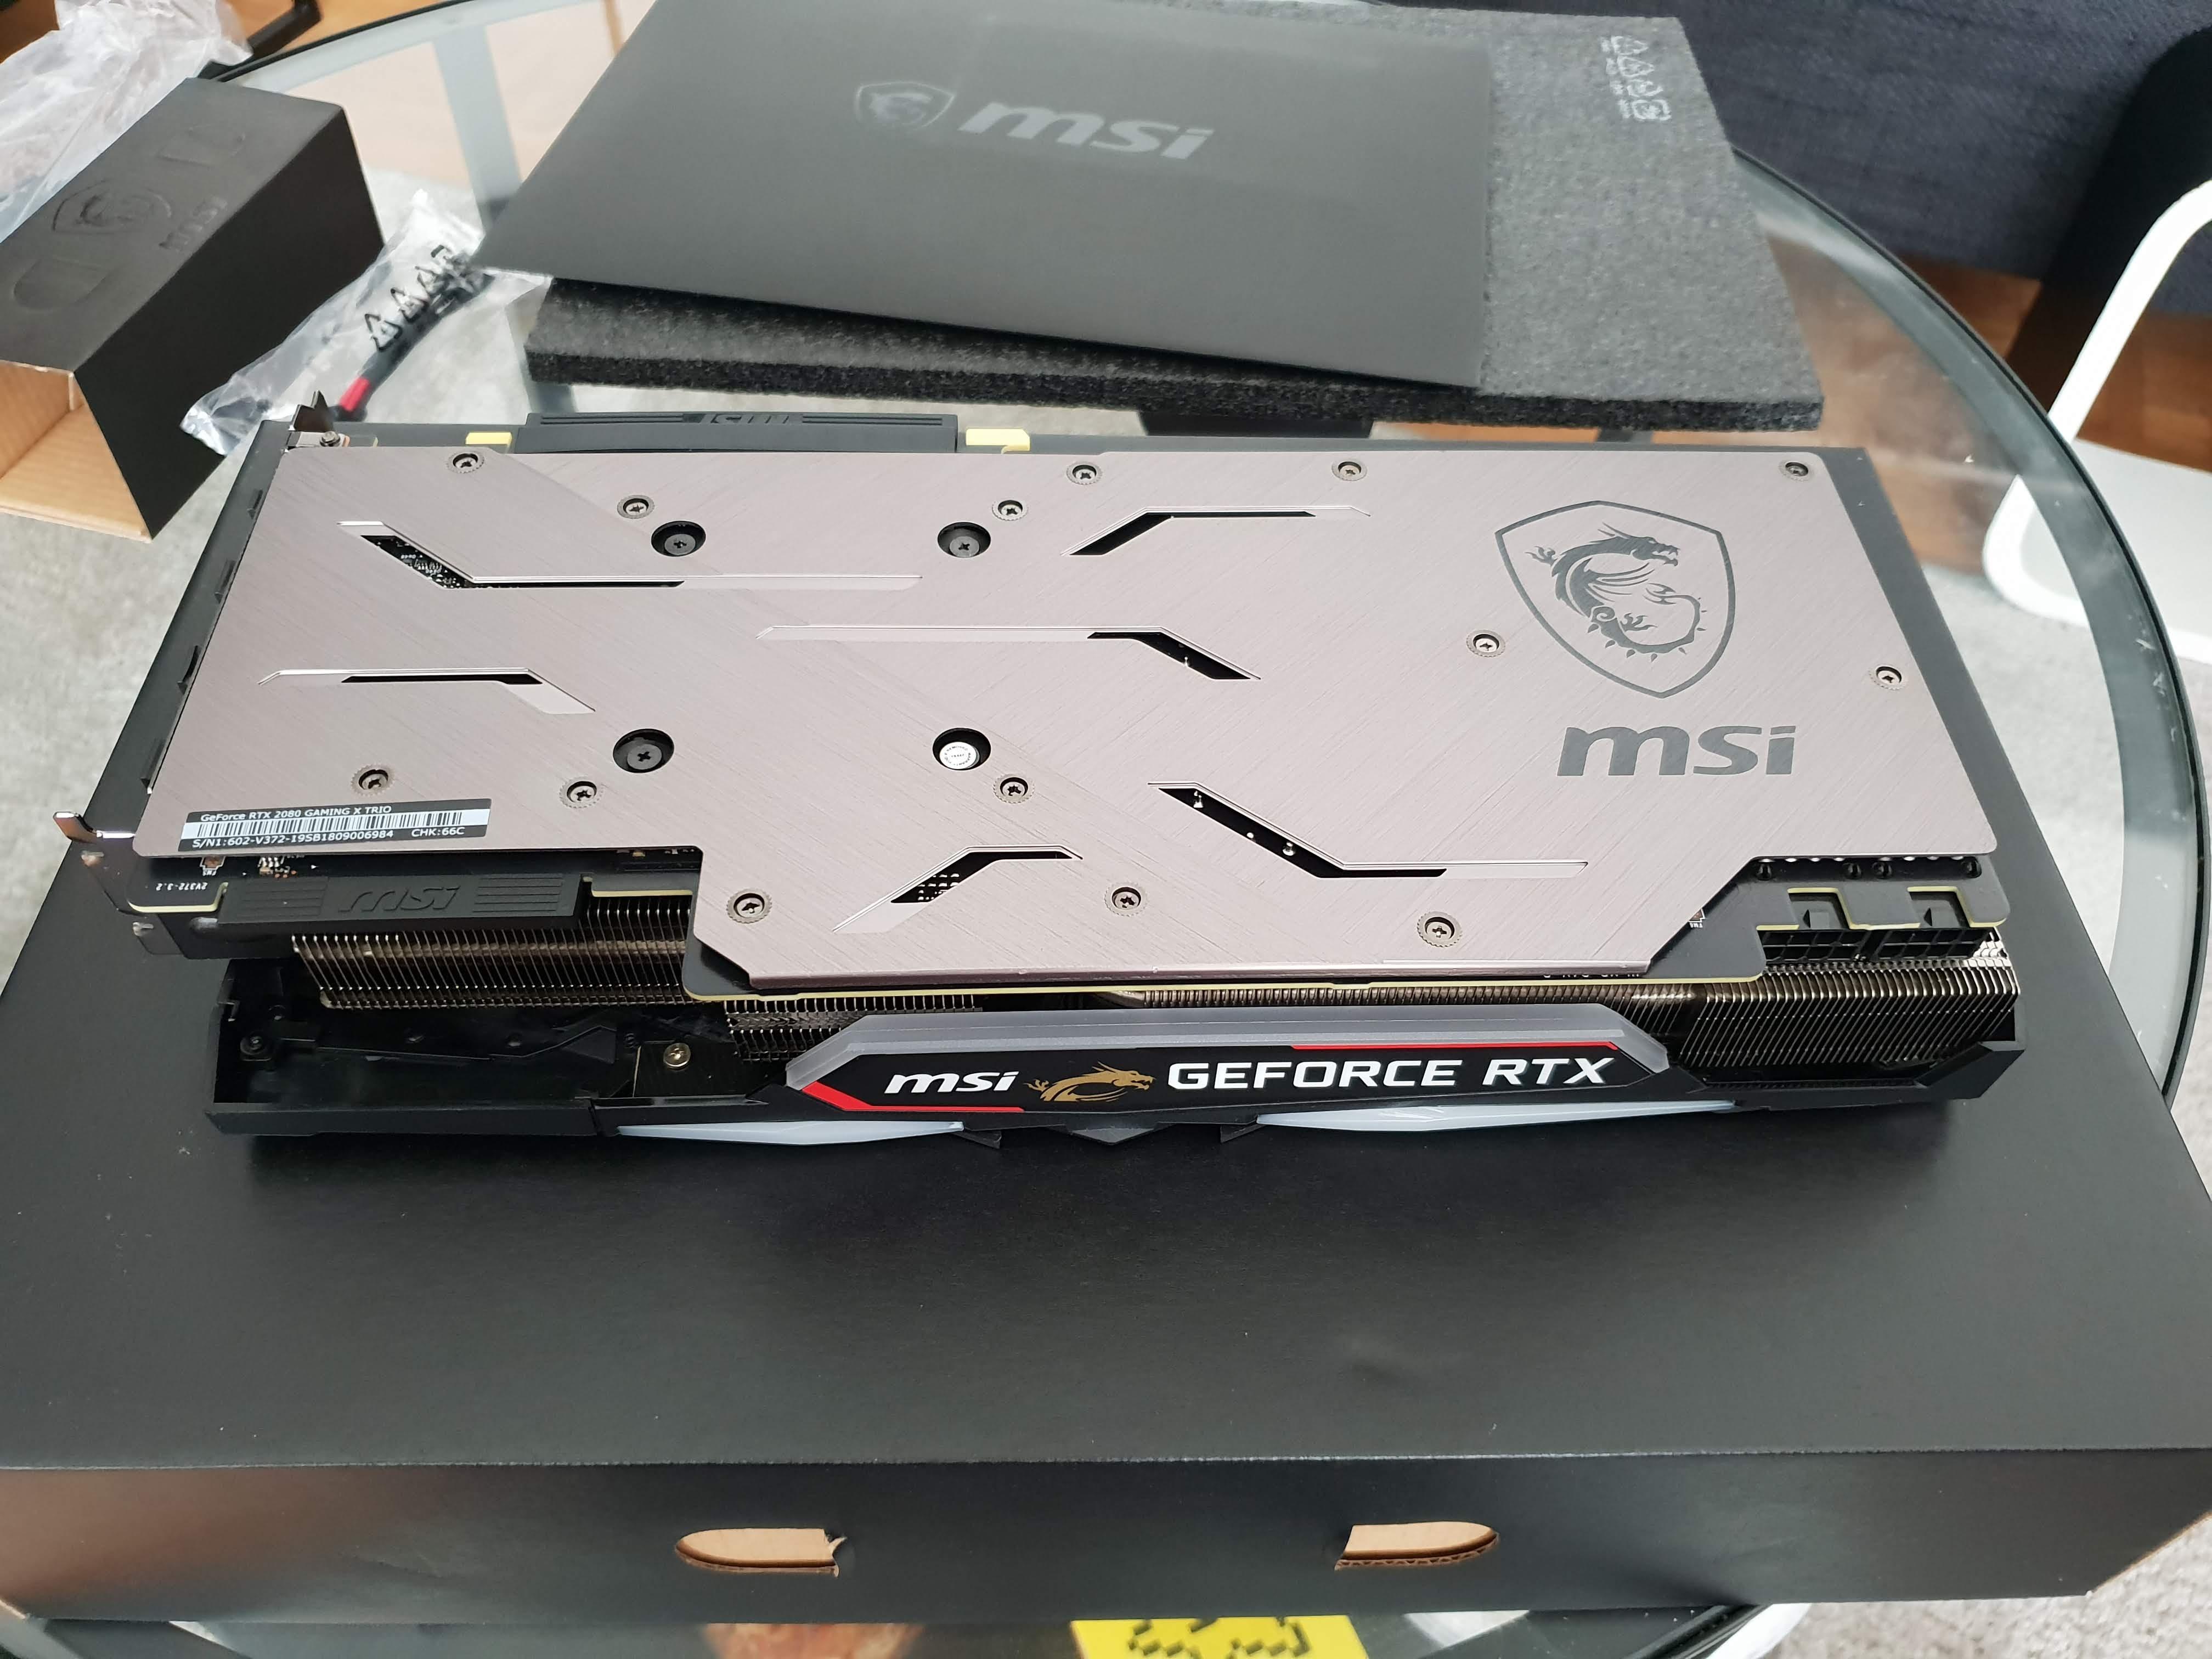 MSI GeForce RTX 2080 Gaming X Trio - FuriousB - Userreviews - Tweakers